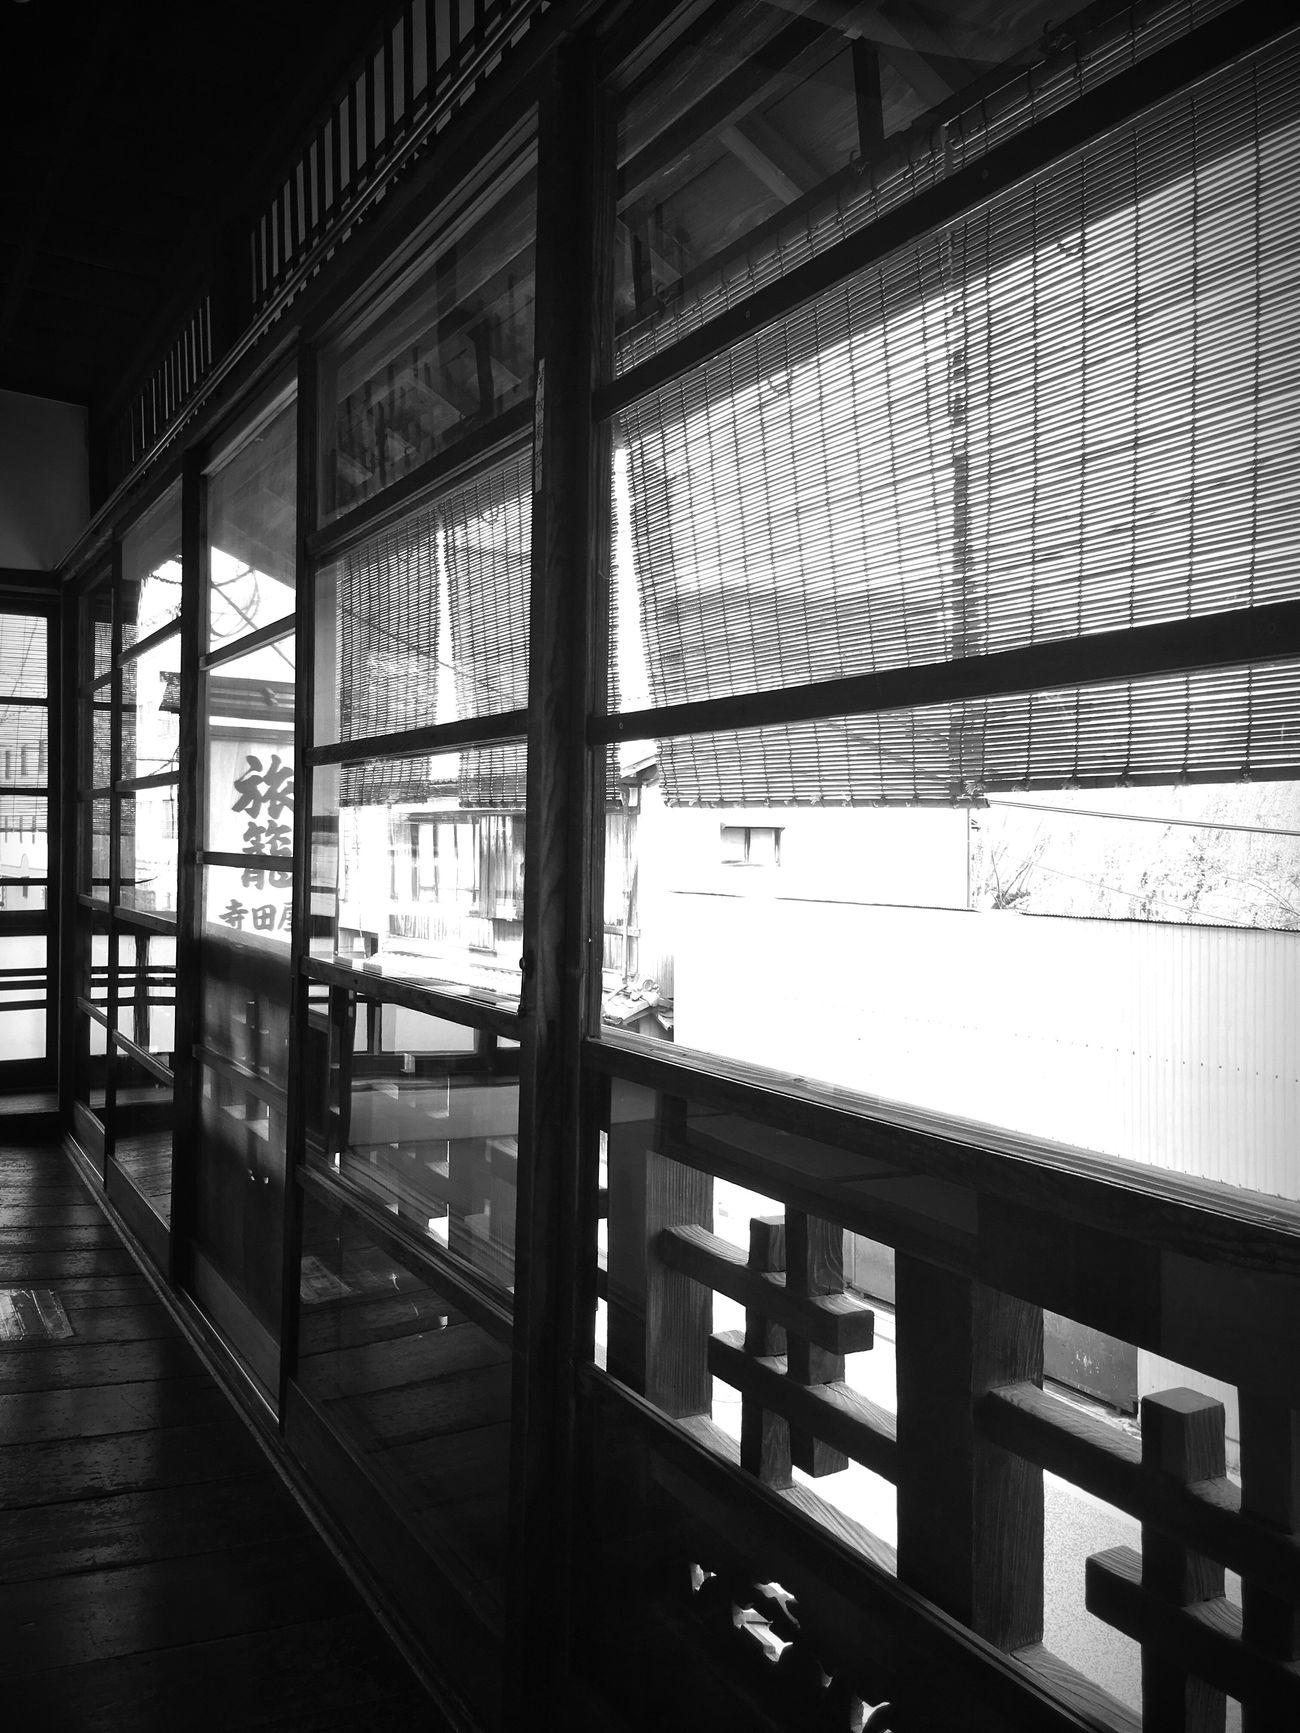 Historic Kyoto Japan Sakamoto Ryoma Terada-ya 坂本龍馬 寺田屋 Monochrome This place is tastefully laid out.